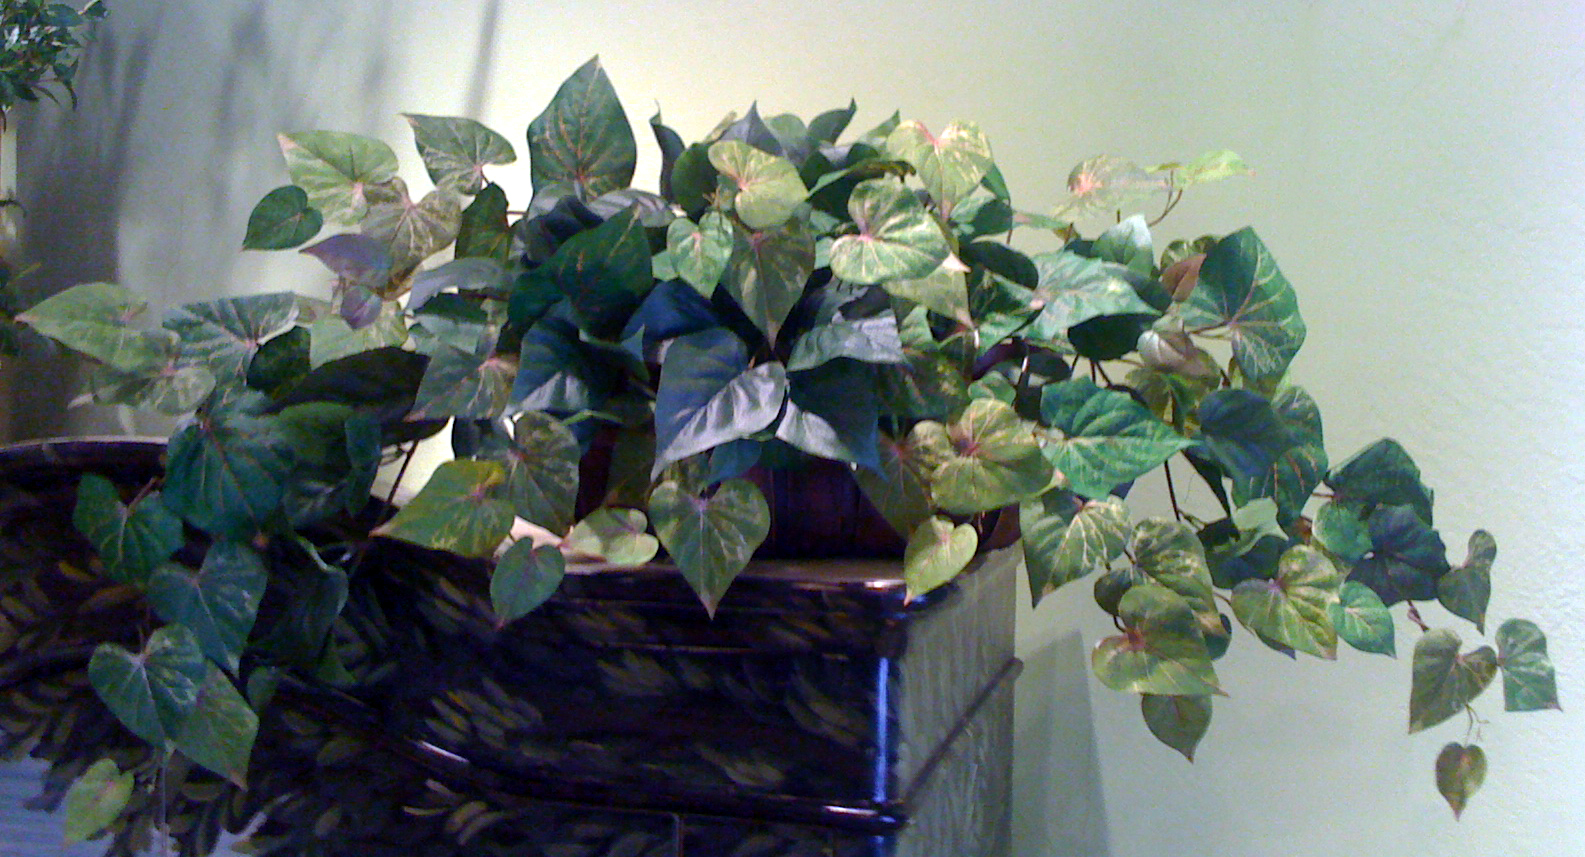 Potato Ivy Ledge Garden